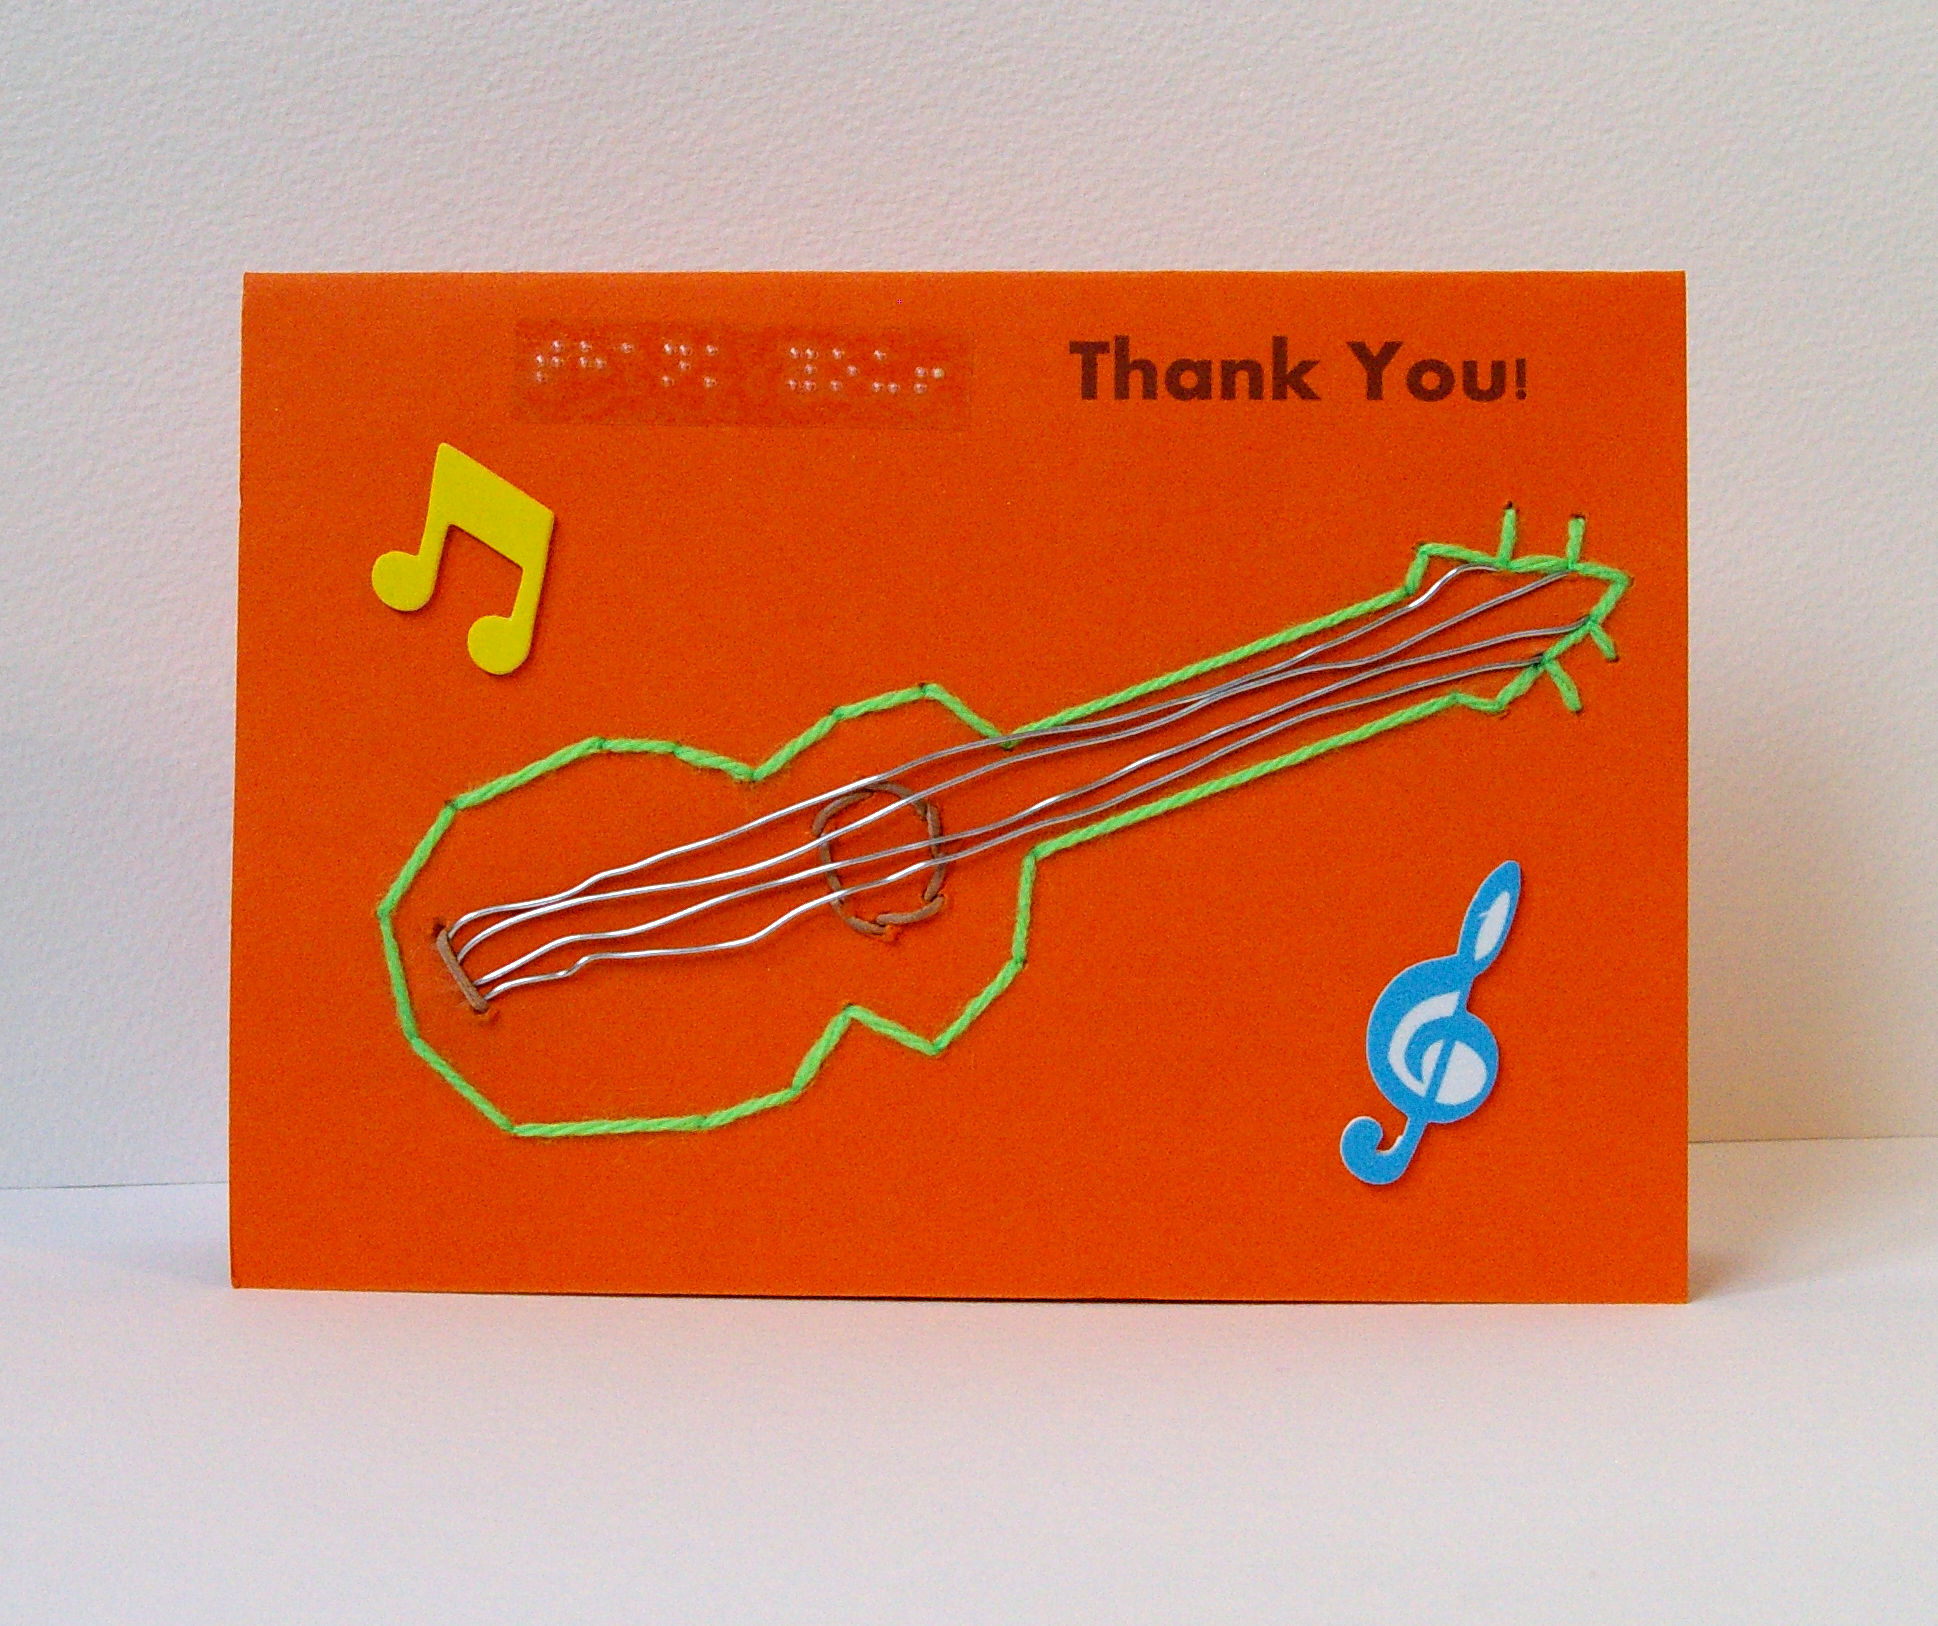 Thank you guitarmusic greetings card arts coaching training thank you kristyandbryce Choice Image